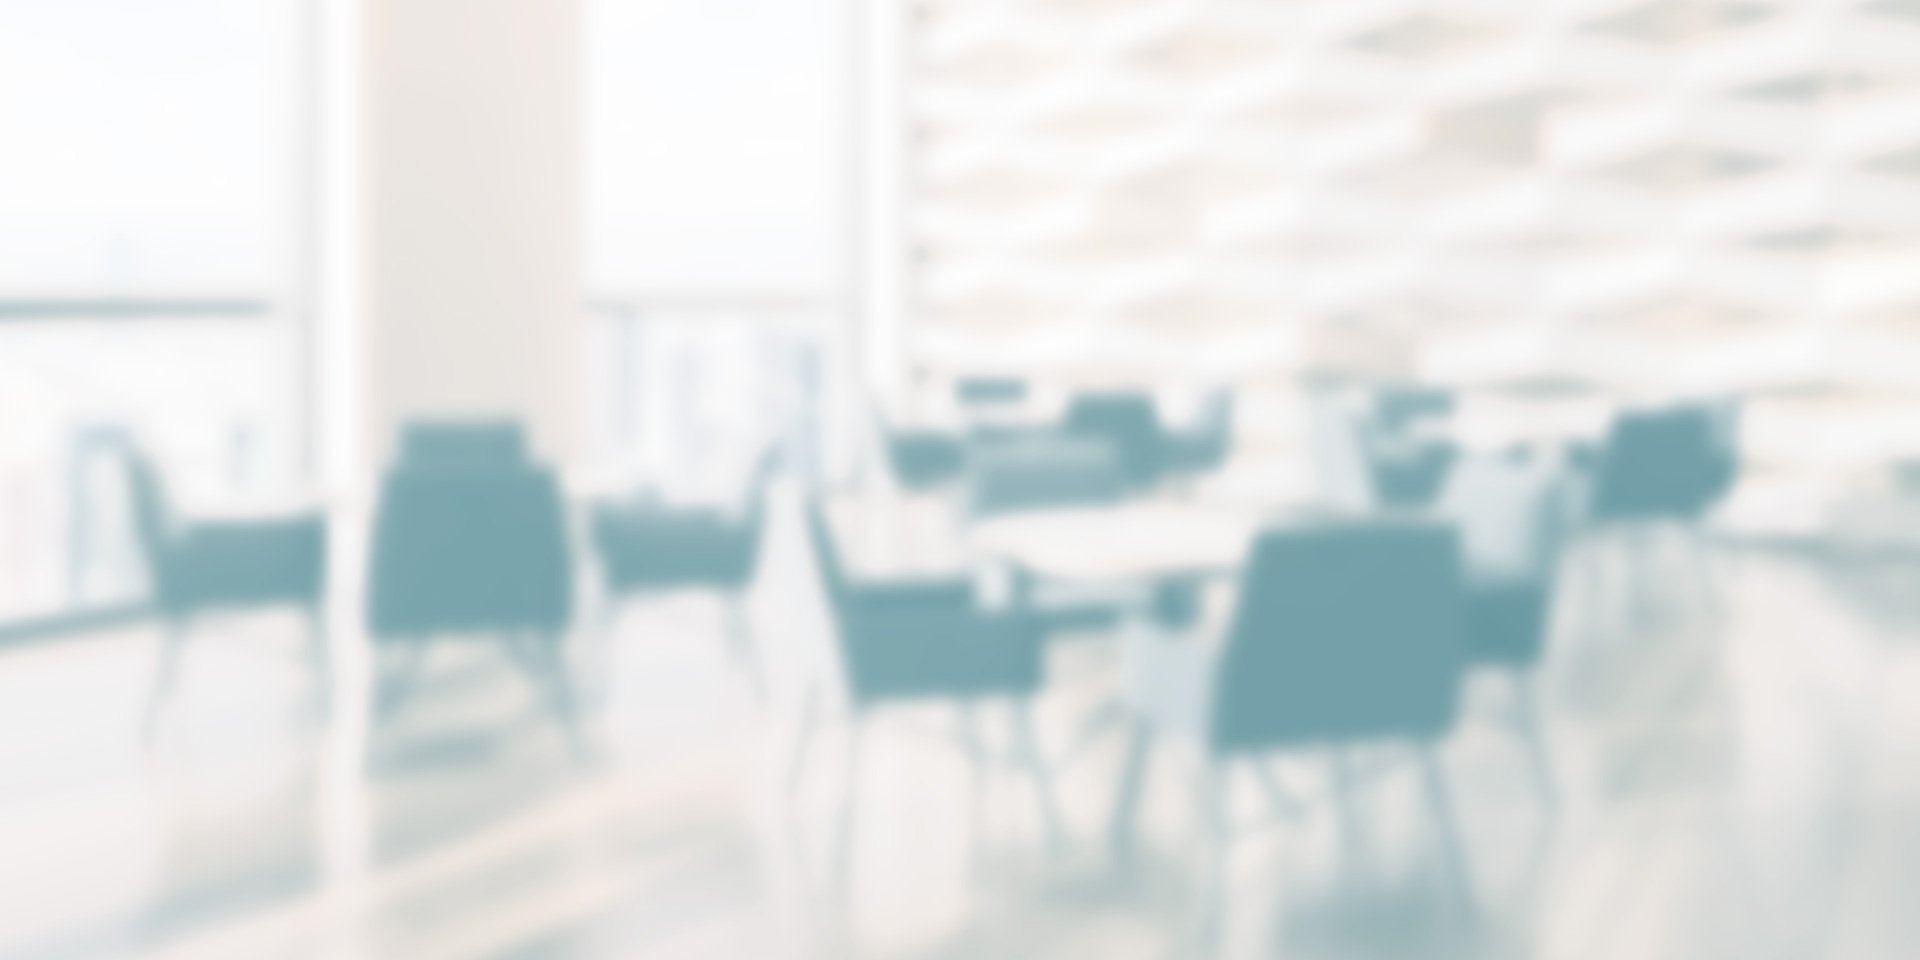 Cafeteria Blurred